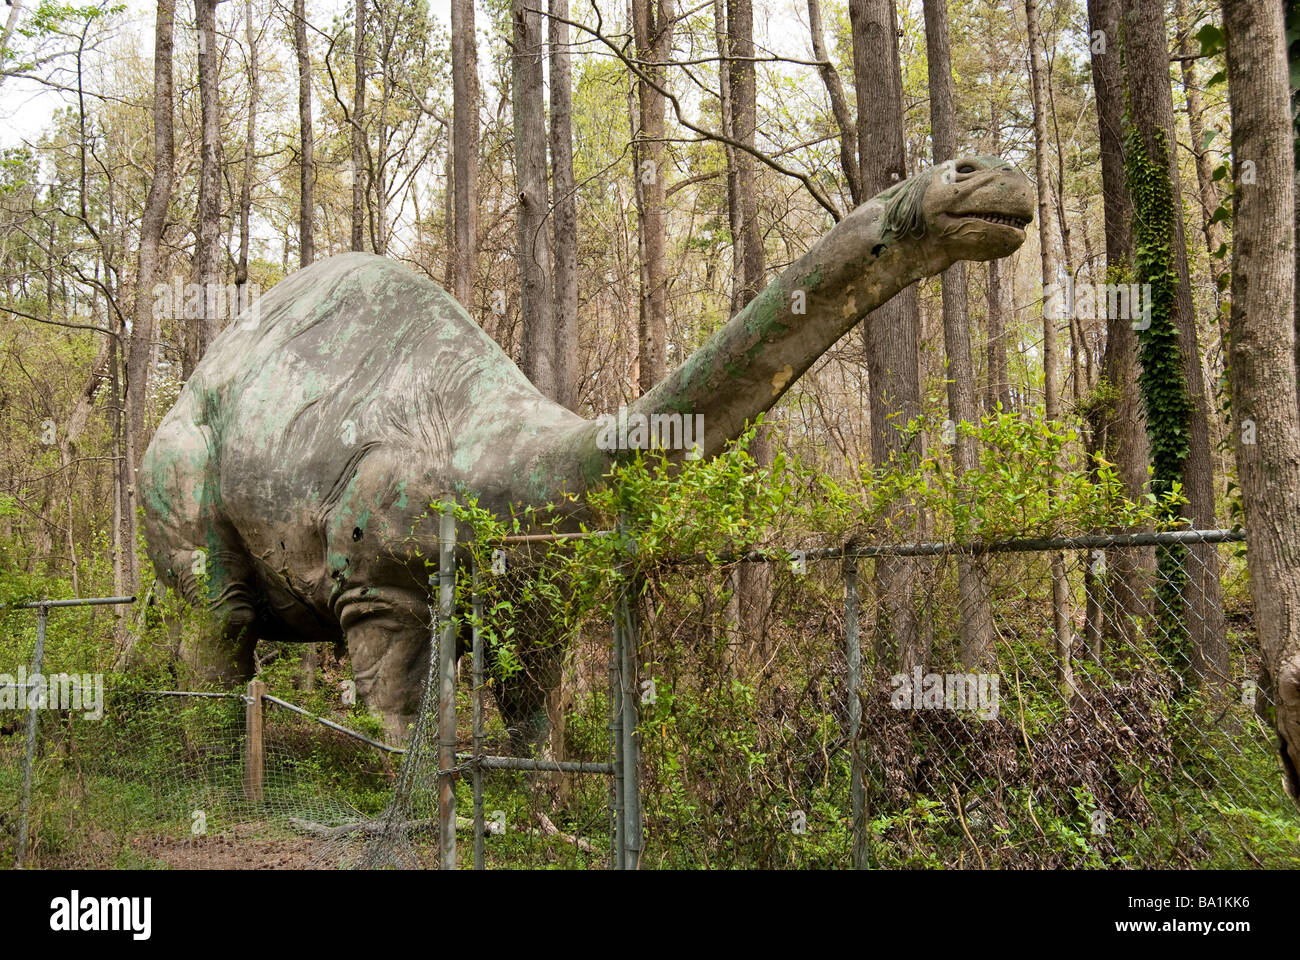 Neglected Statue of a Brontosaurus Dinosaur - Stock Image